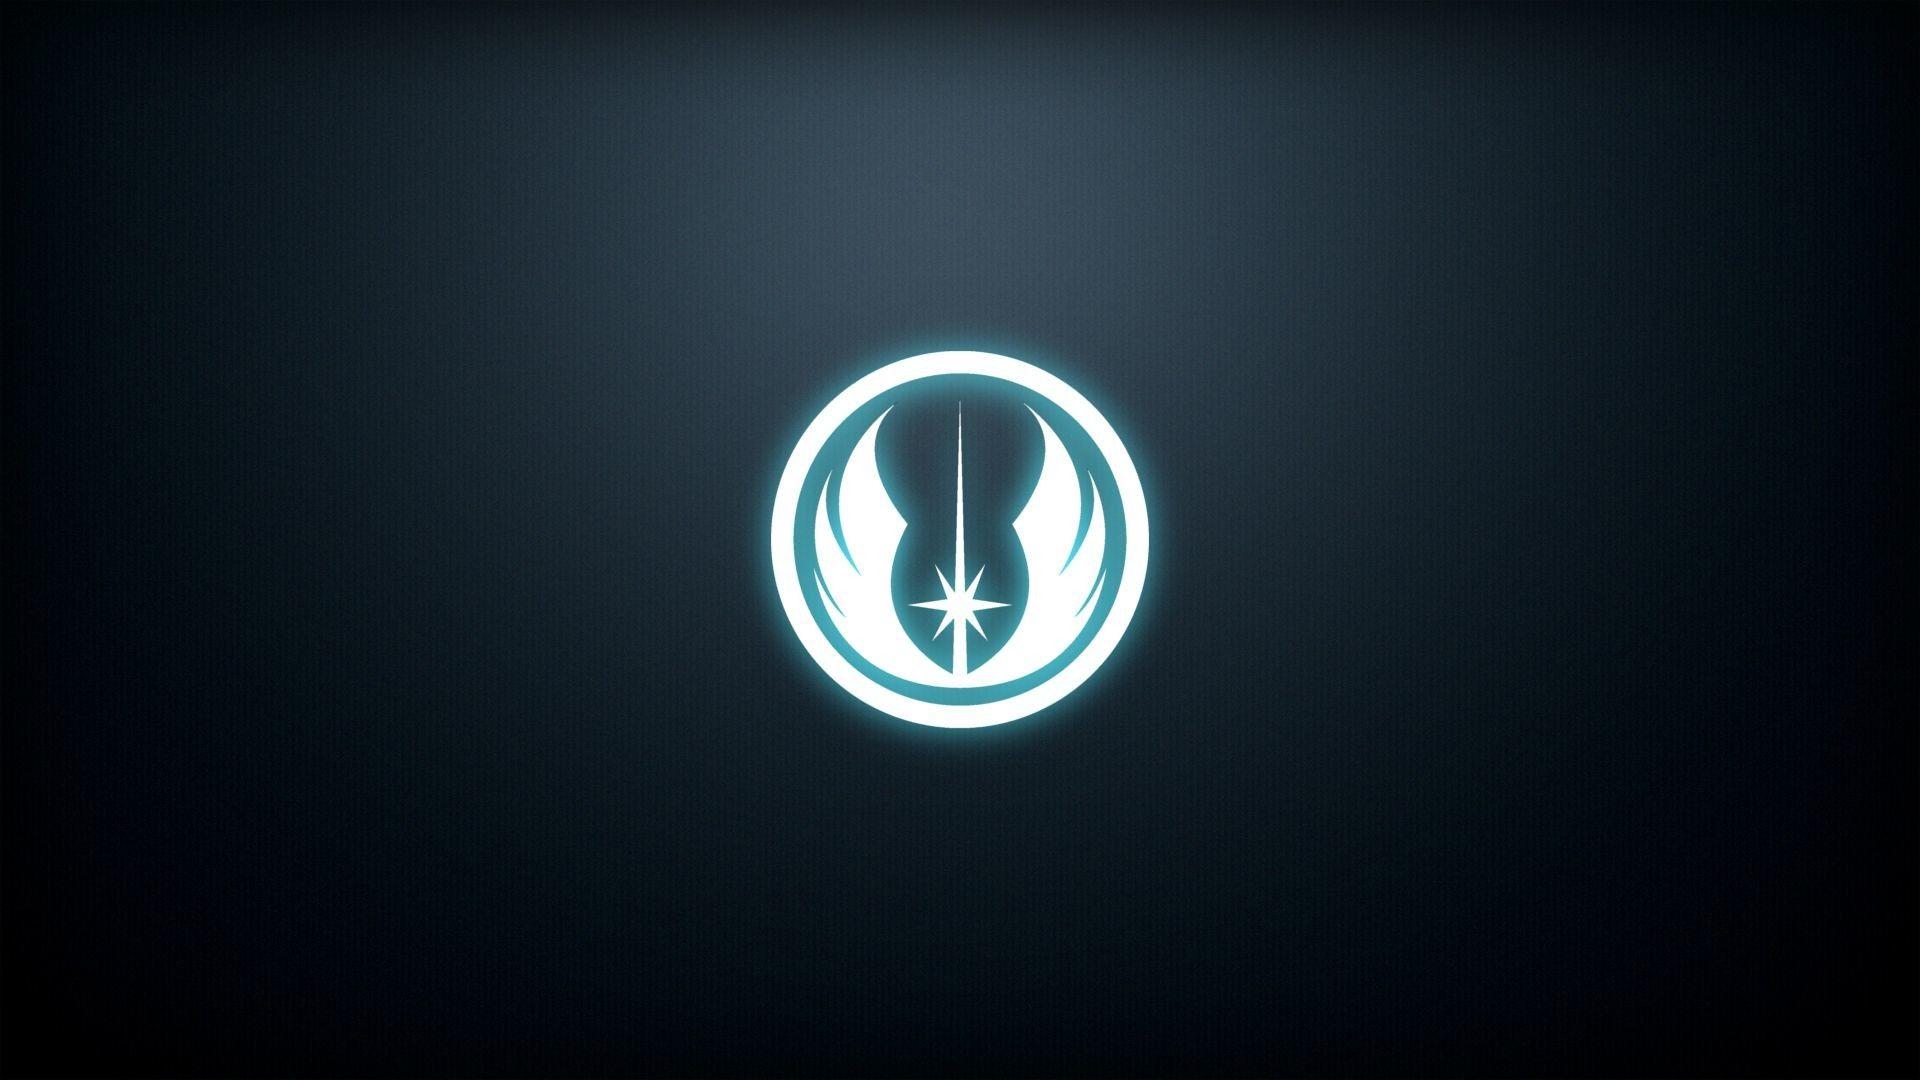 Star Wars Jedi Wallpapers   Top Star Wars Jedi Backgrounds 1920x1080